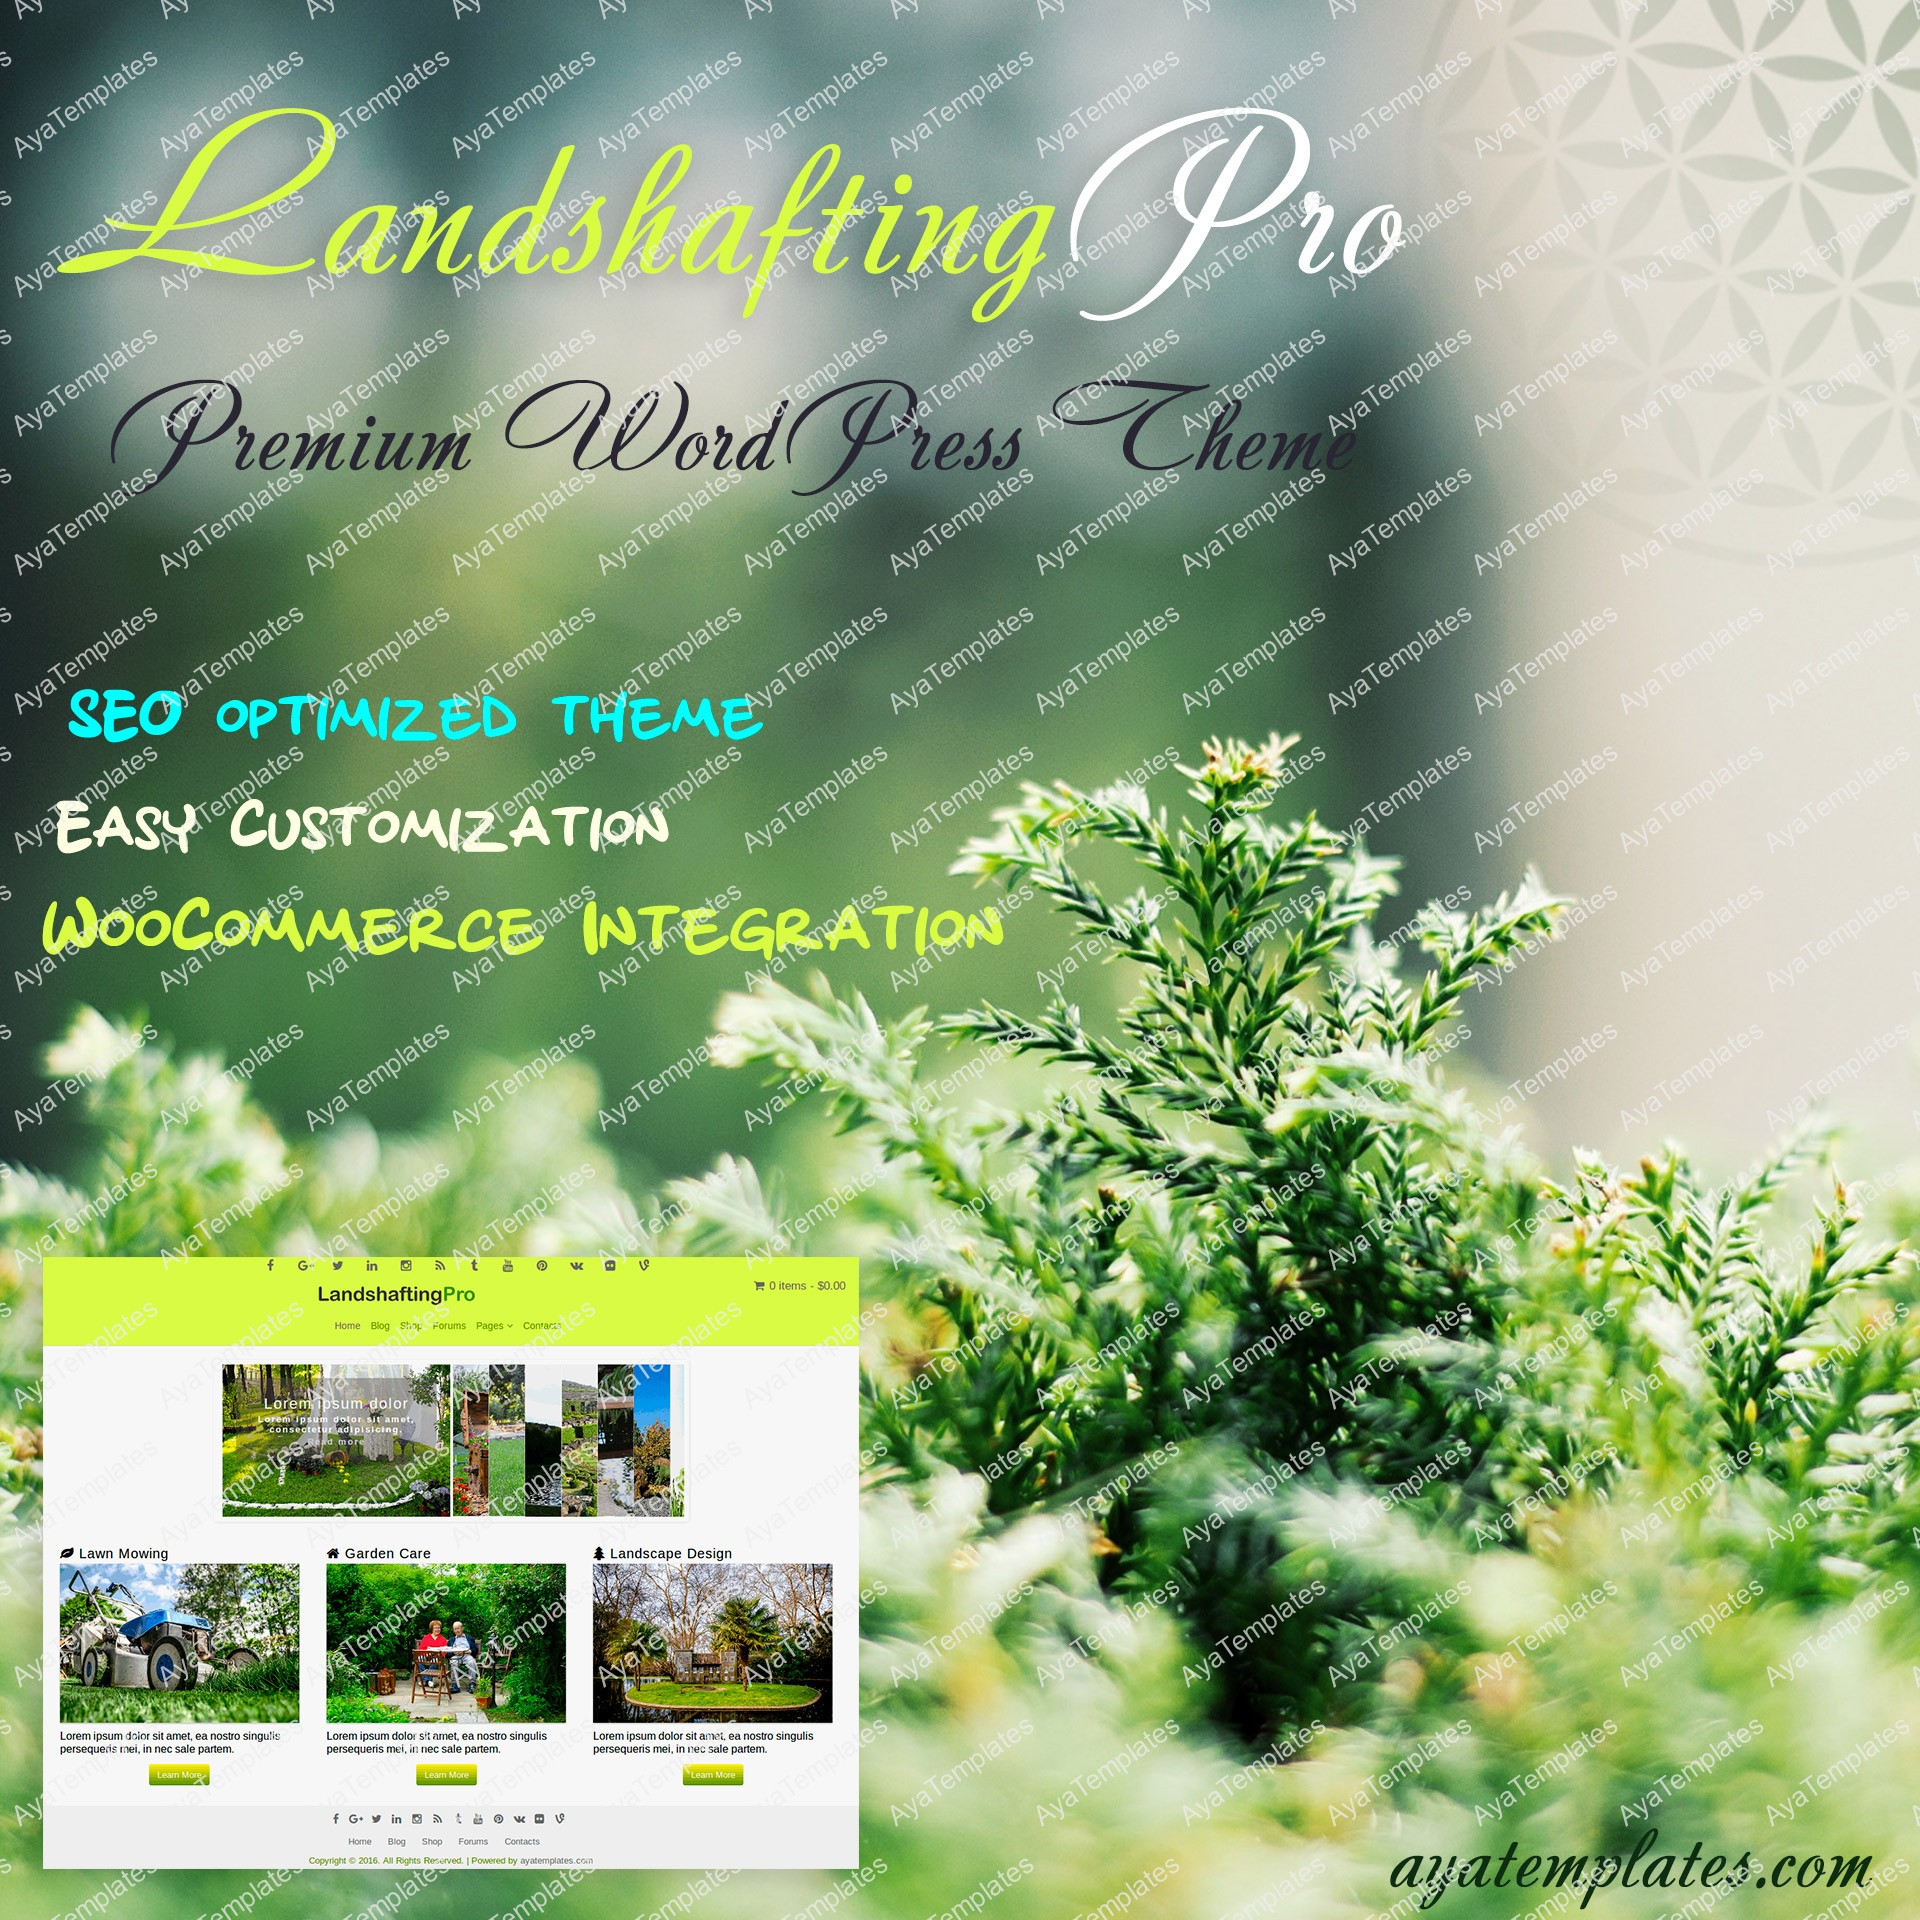 landshaftingpro-premium-wordpress-theme-mockup-ayatemplates-com